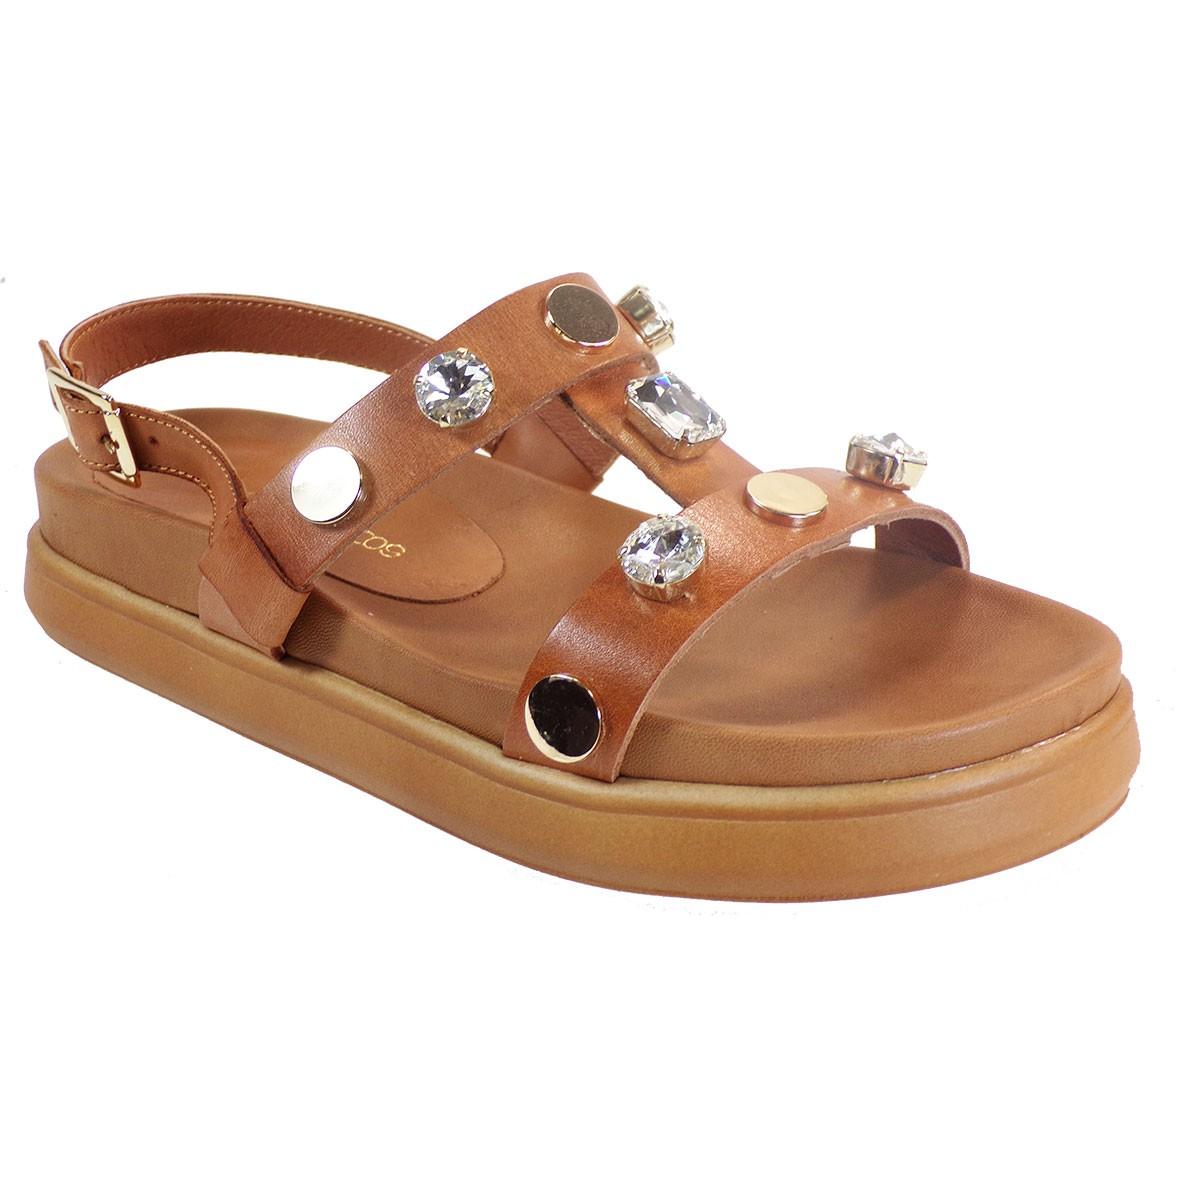 Xaris Kazakos Γυναικεία Παπούτσια Πέδιλα 3512 Ταμπά Δέρμα